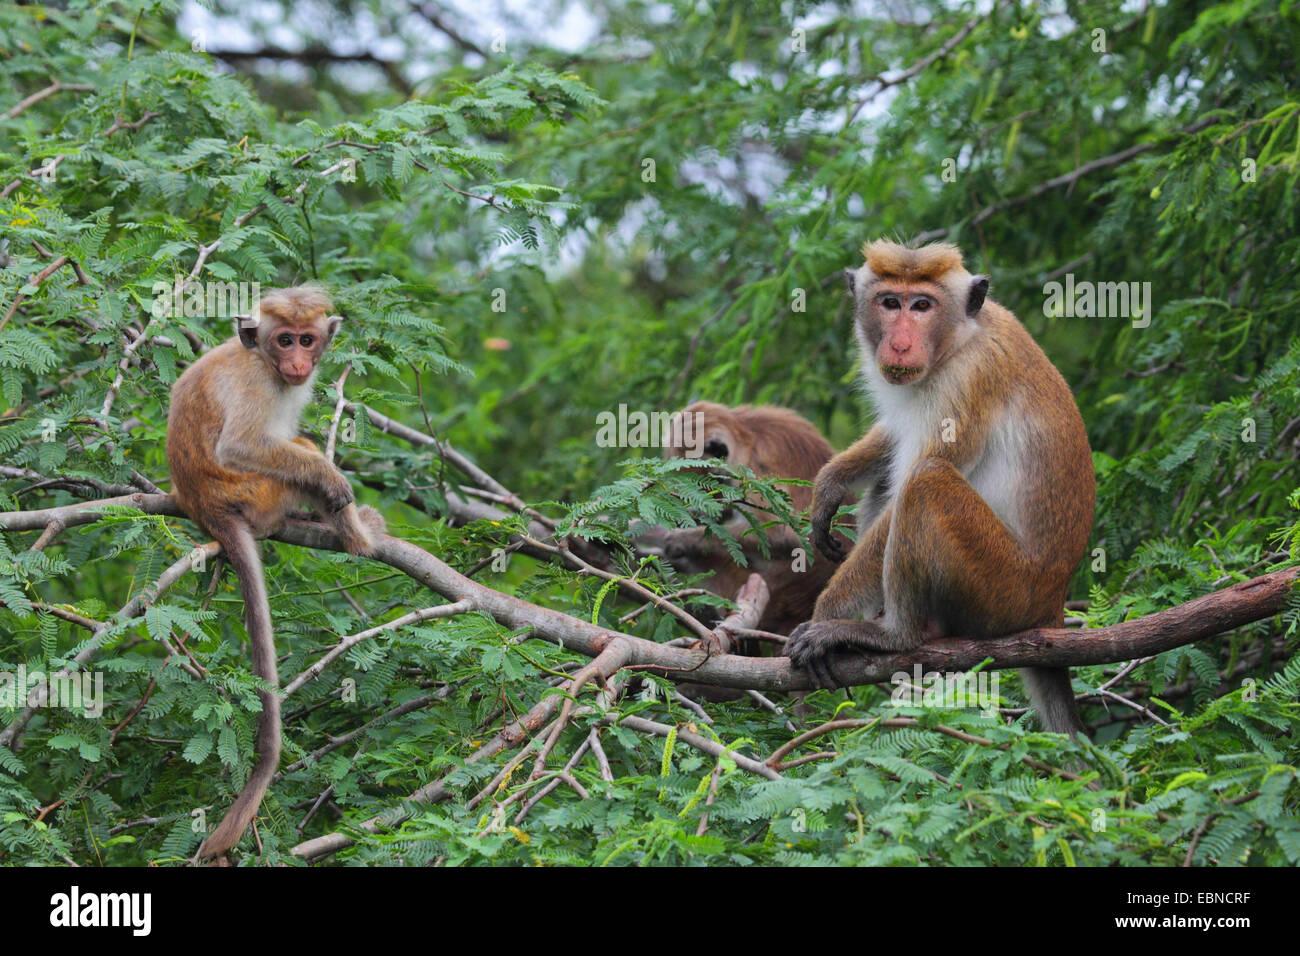 toque macaque (Macaca sinica), animal family sitting on a branch, Sri Lanka, Bundala National Park Stock Photo